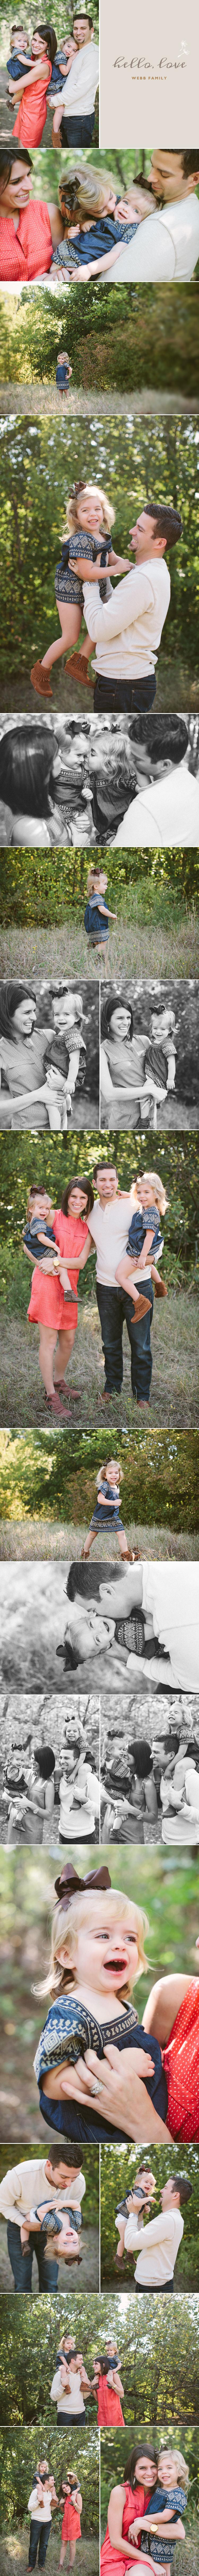 Webbfamily2014fallblog.jpg